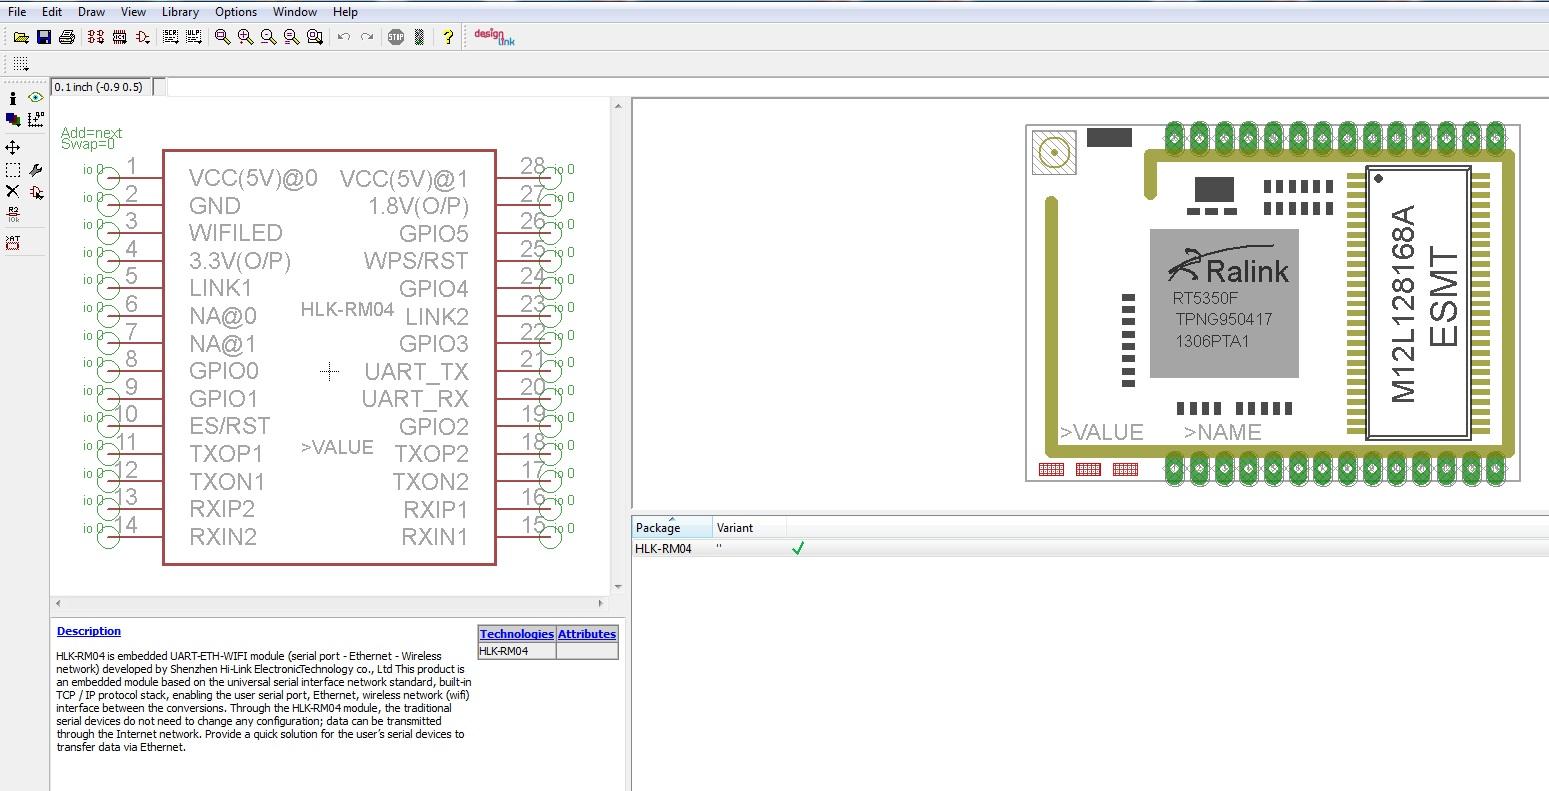 Tc4421 Datasheet Tc4421cpa Telcomdip803 Ic Chips Utsource Microchip Tc4422 High Speed Mosfet Drivers Szukam Podziel Si Biblioteki Eagle 84 Elektrodapl